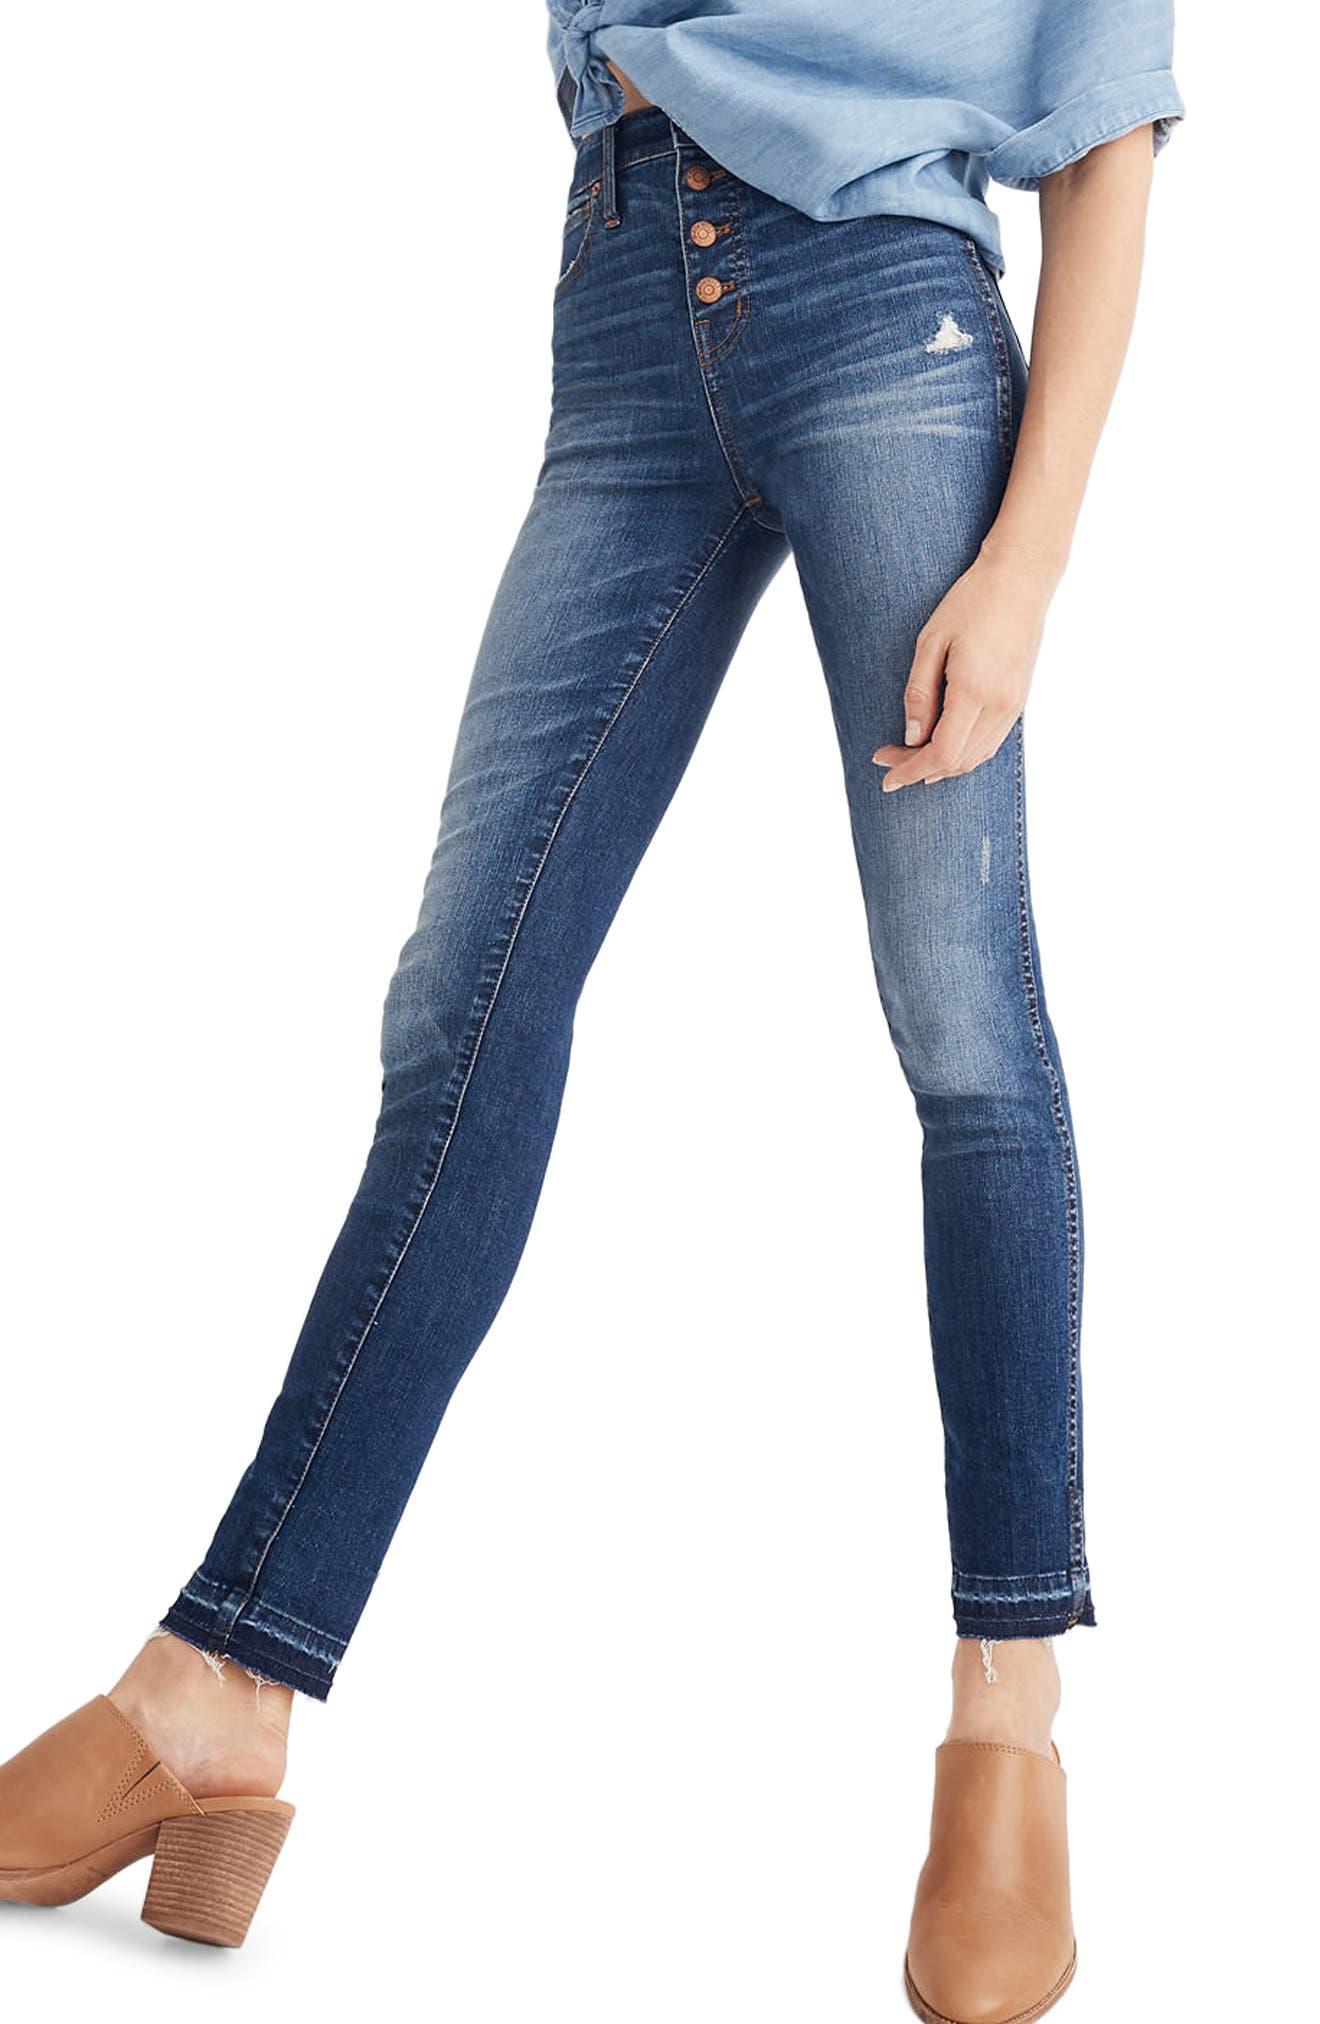 10-Inch High Waist Drop Hem Skinny Jeans,                             Main thumbnail 1, color,                             400